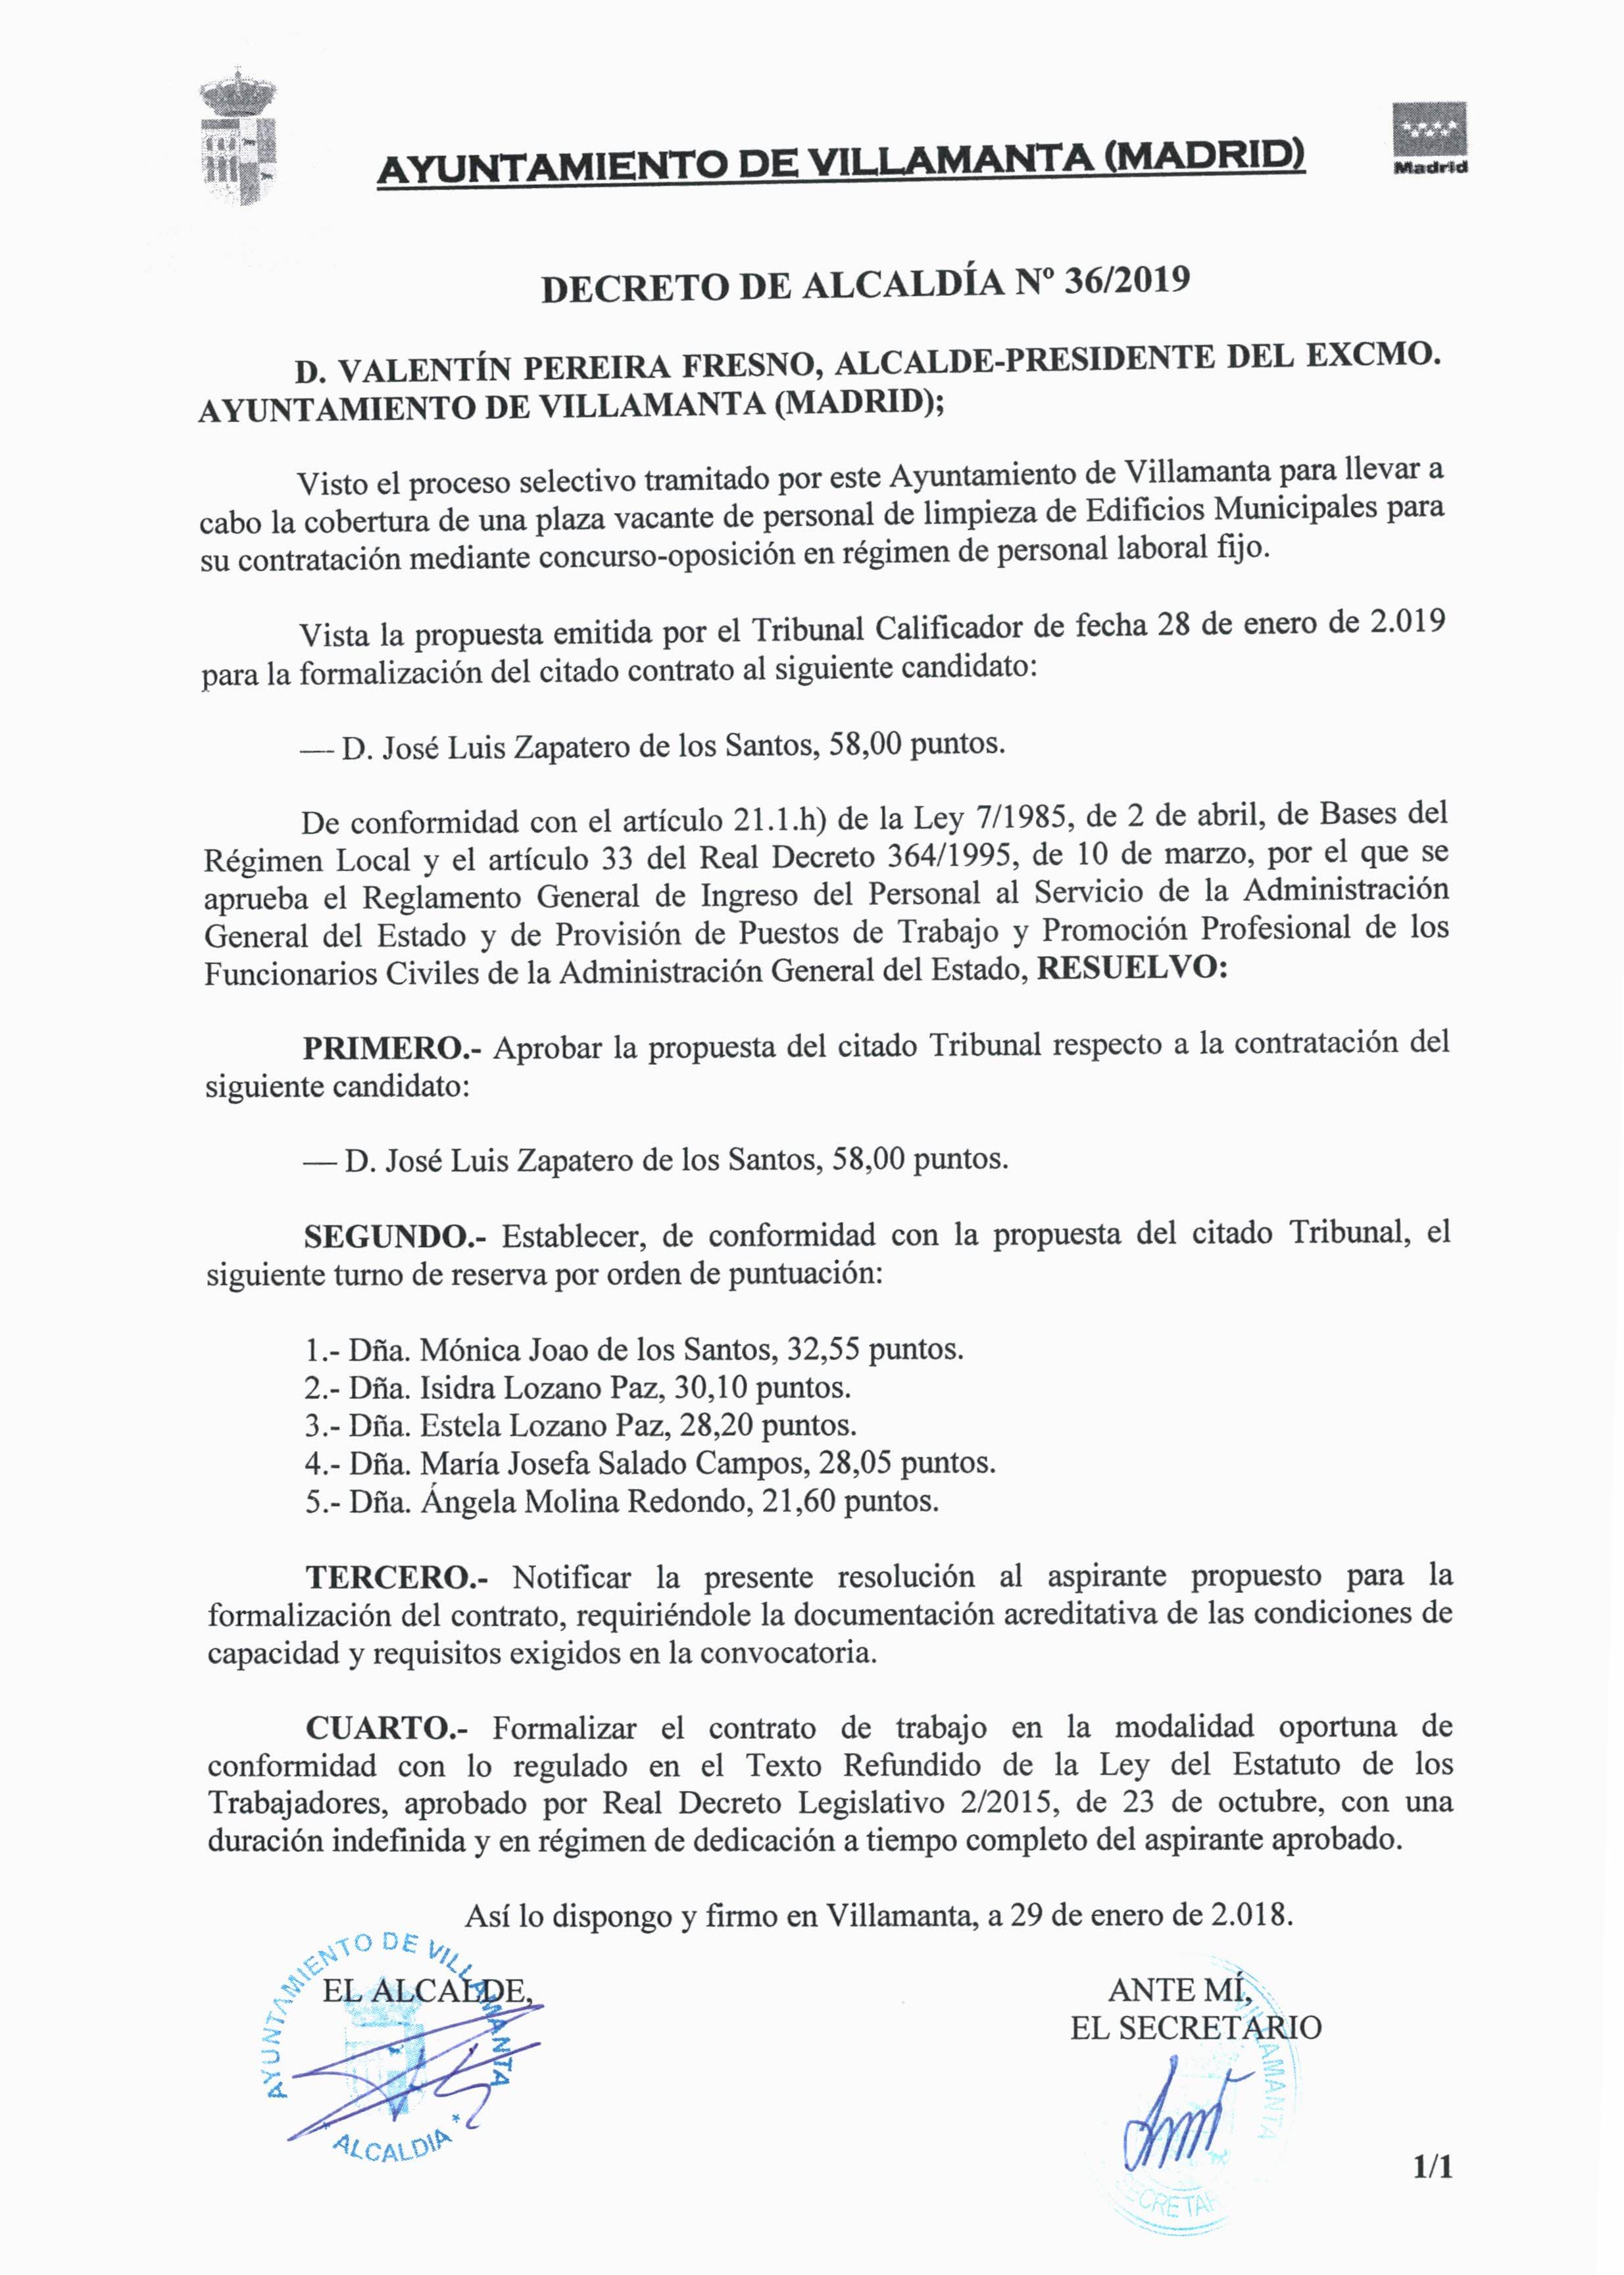 Decreto de Alcaldia 36-19